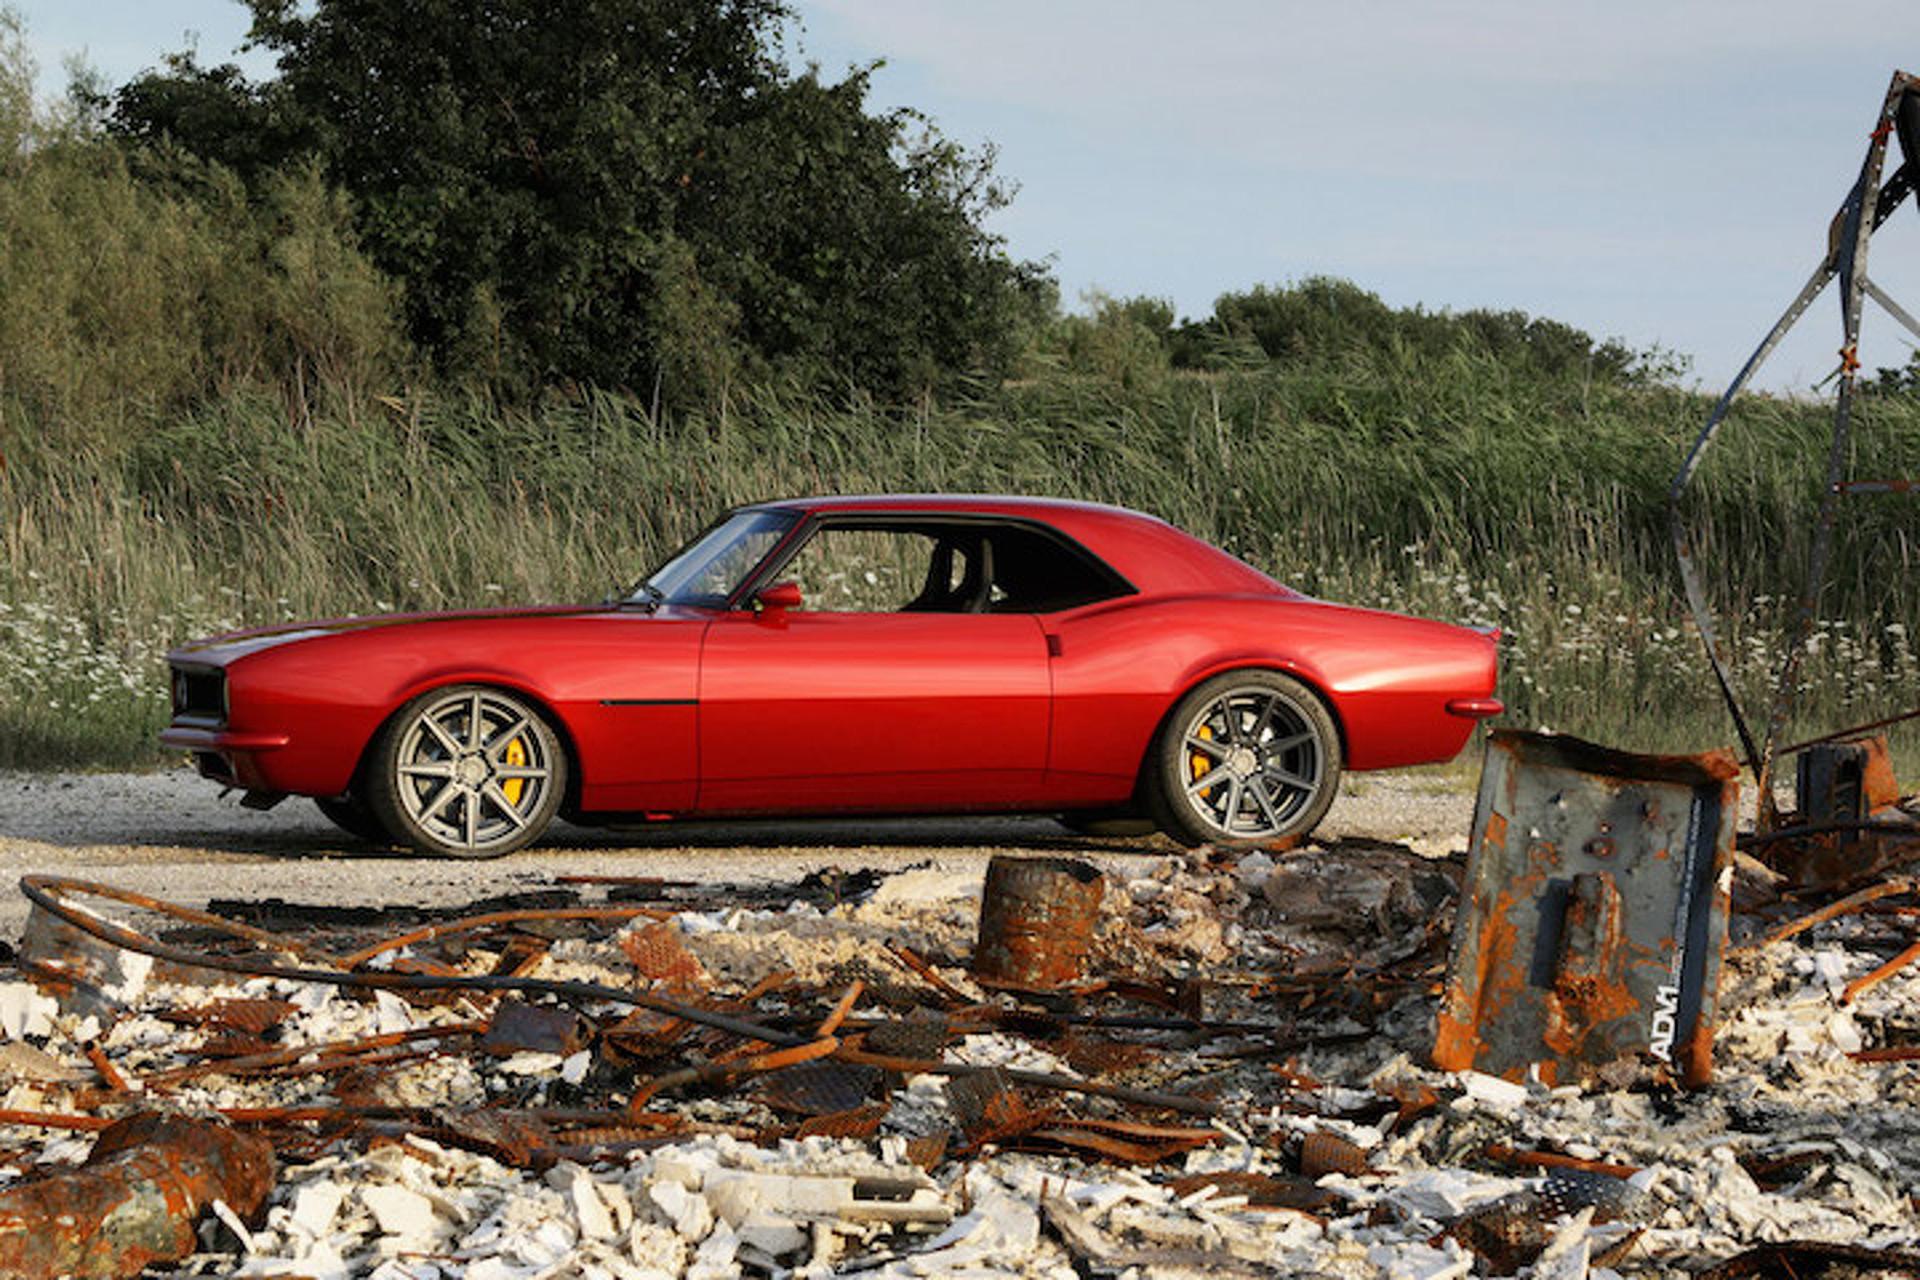 This 1968 Chevrolet Camaro is Rocking Some Aftermarket Wheels Hard